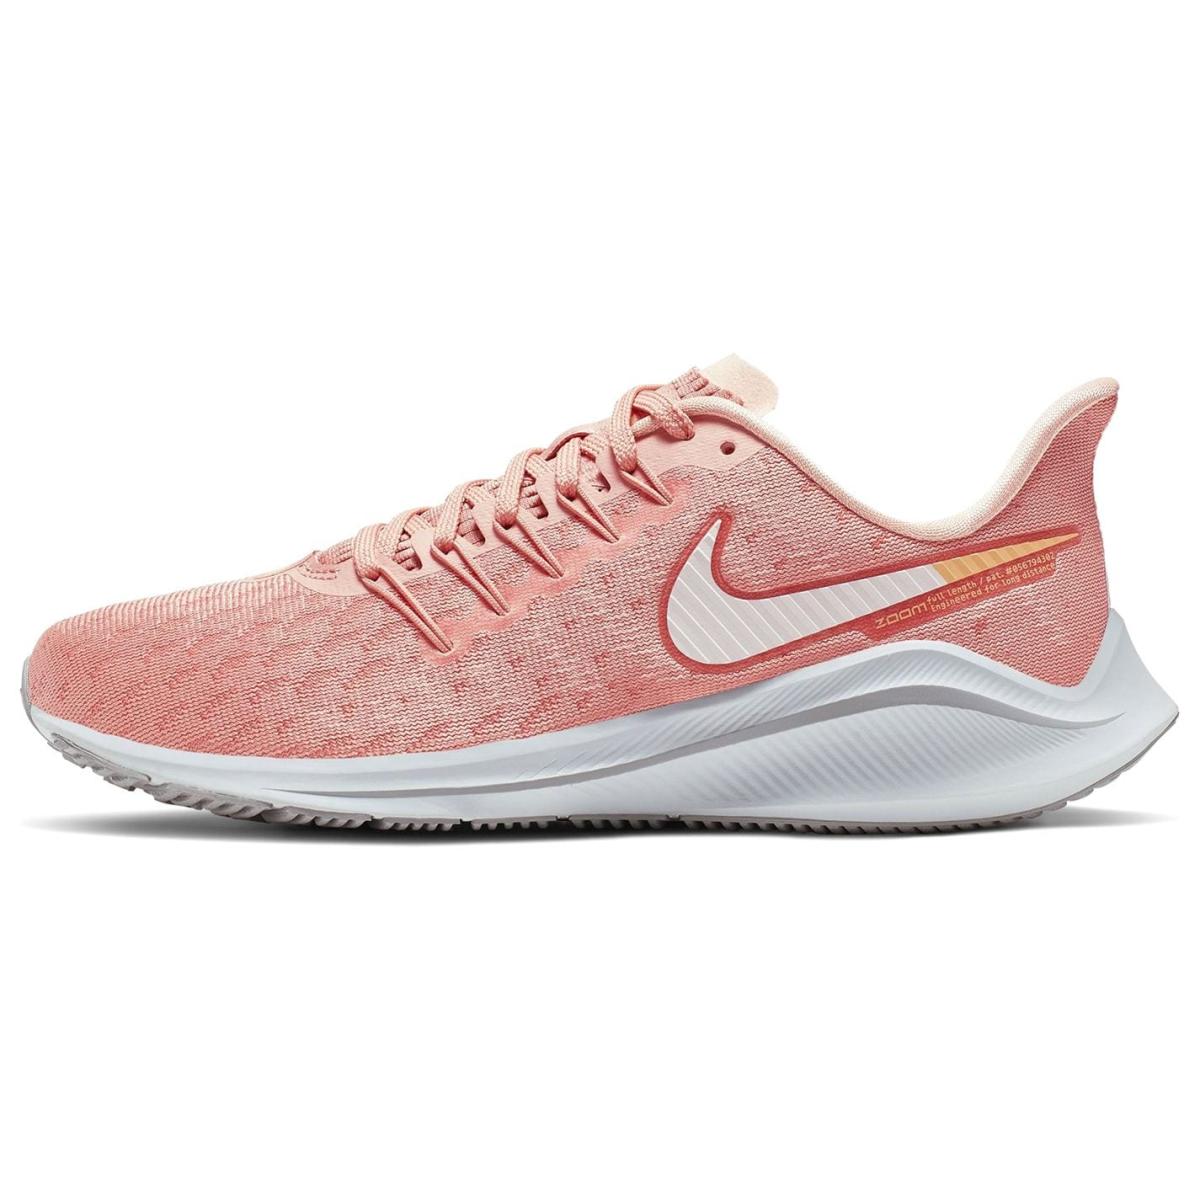 Nike-Zoom-Vomero-14-Turnschuhe-Damen-Sneaker-Sportschuhe-Laufschuhe-4165 Indexbild 4